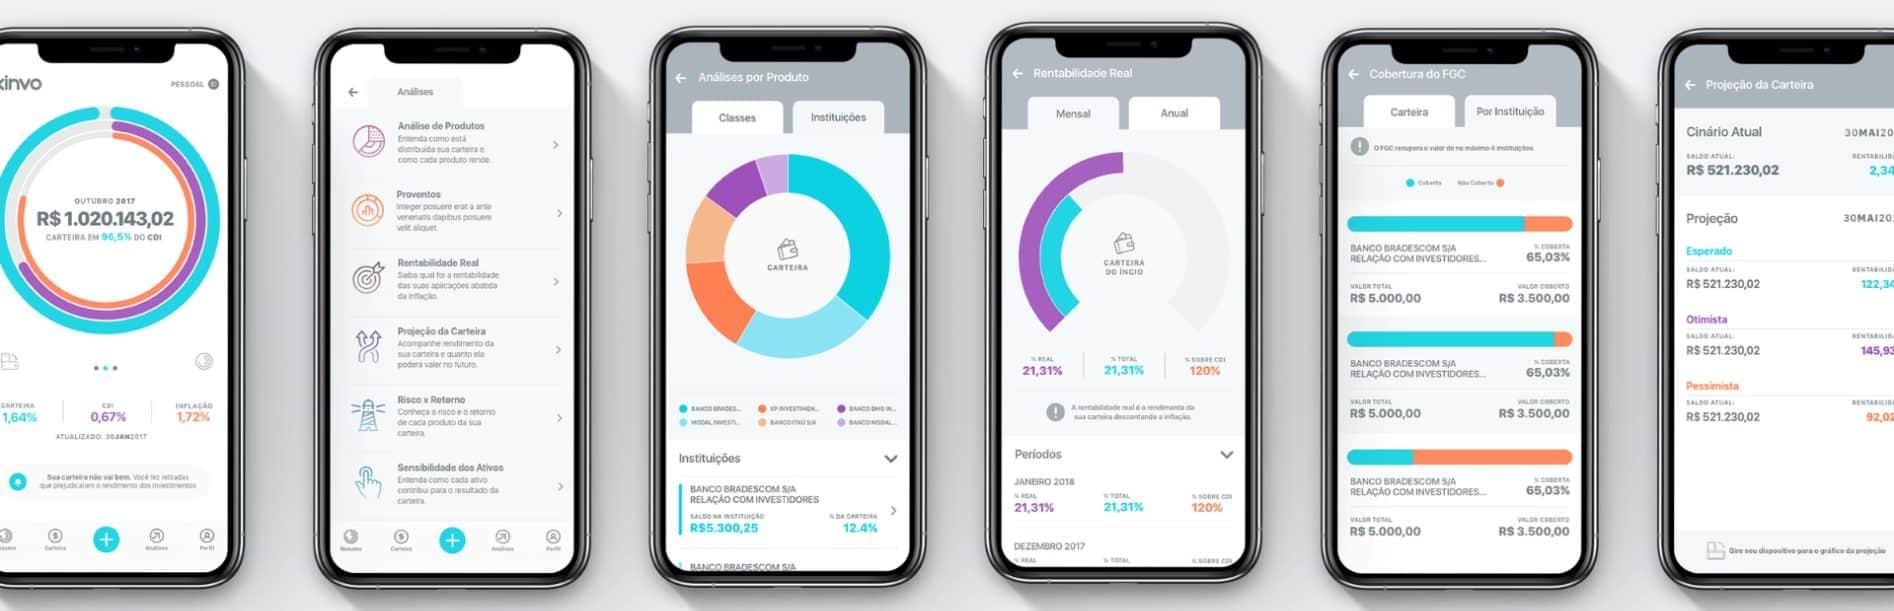 funcionalidades do kinvo app